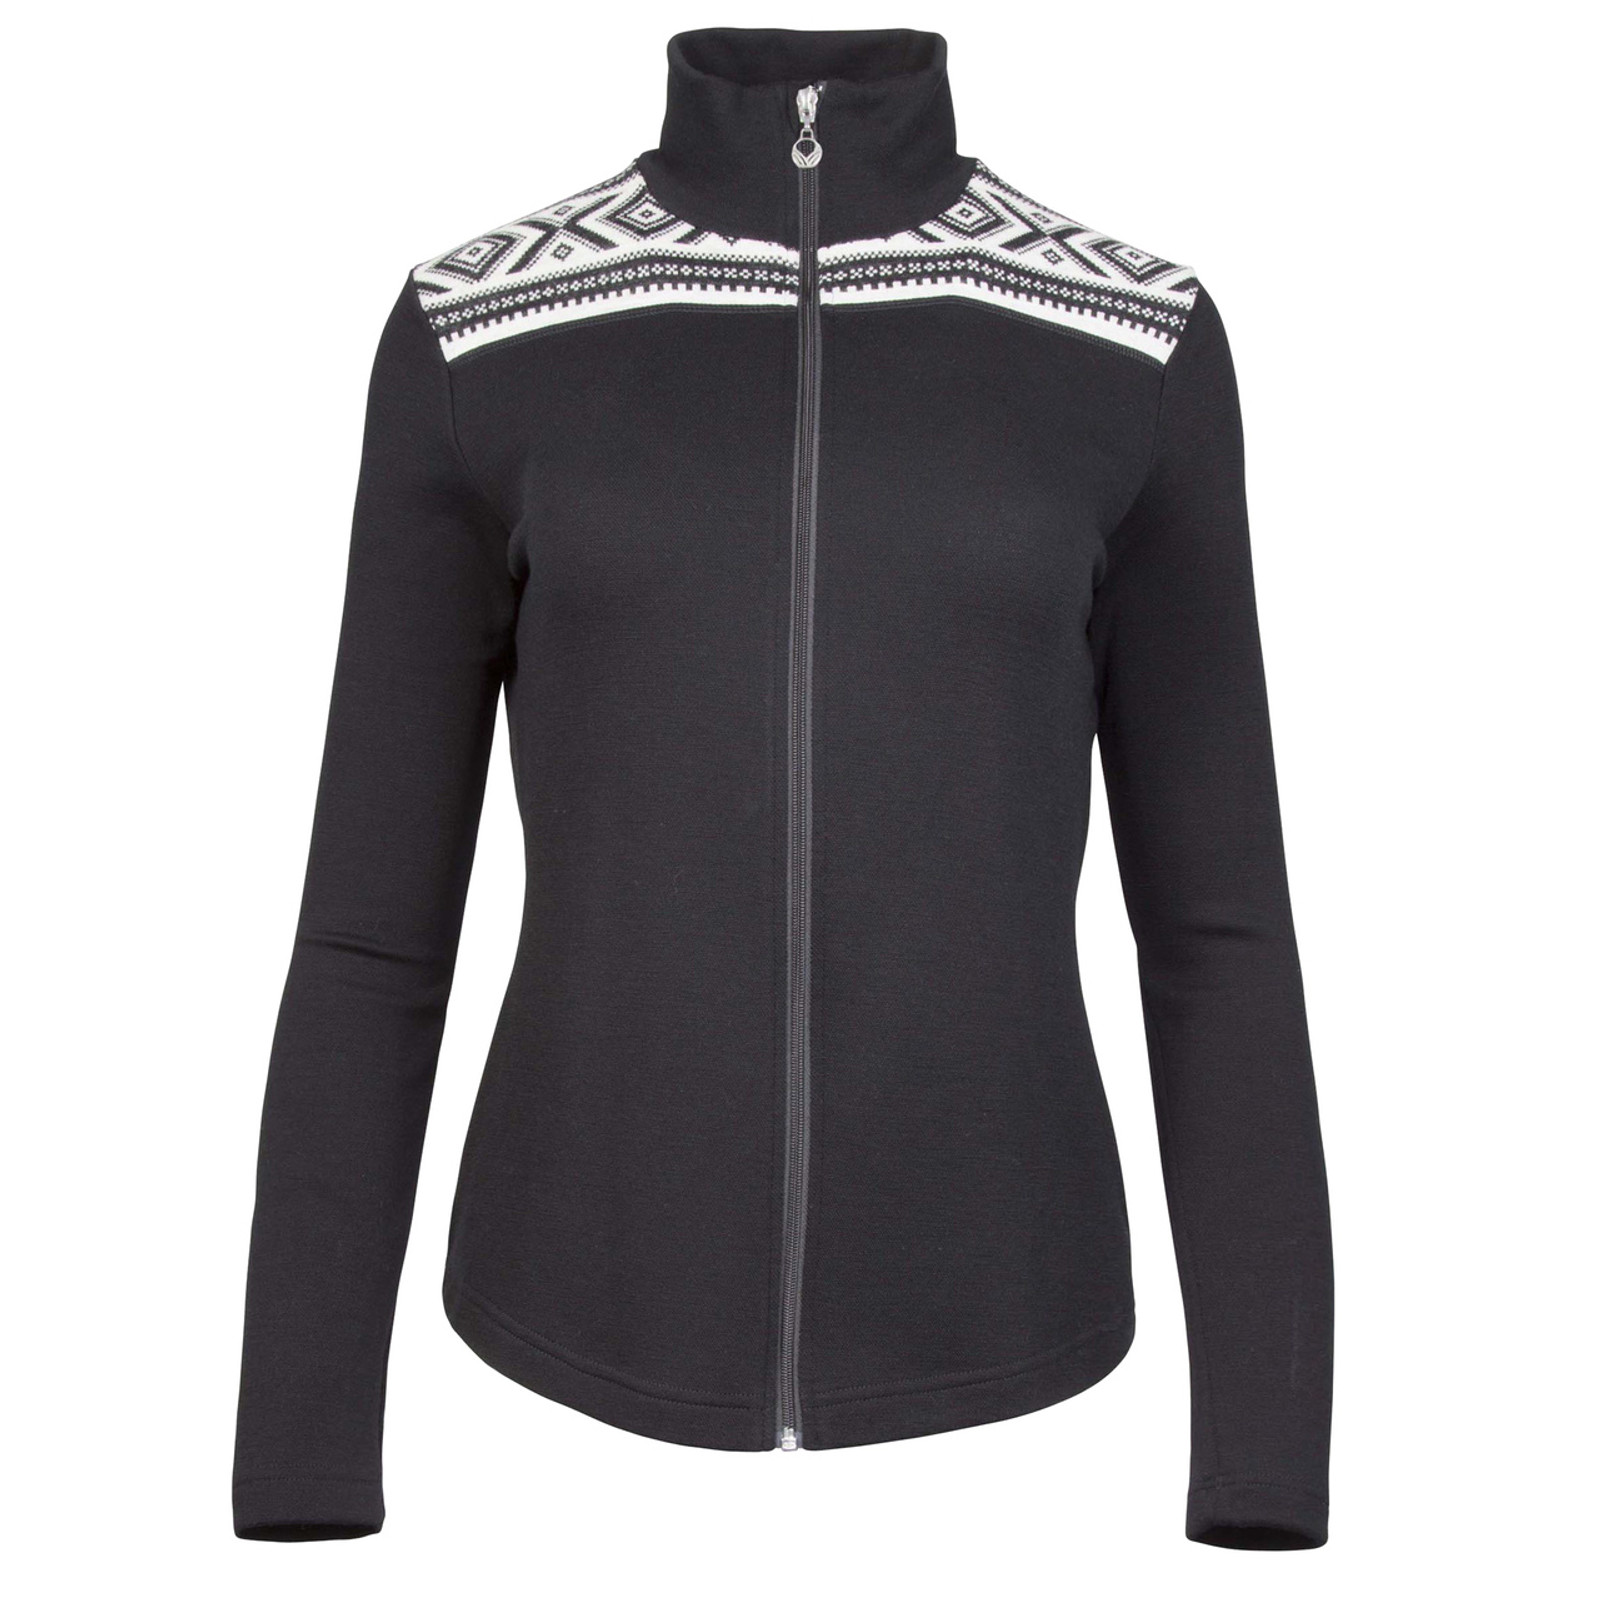 Dale of Norway, Cortina merino cardigan, ladies, in Black/Off White, 83311-F